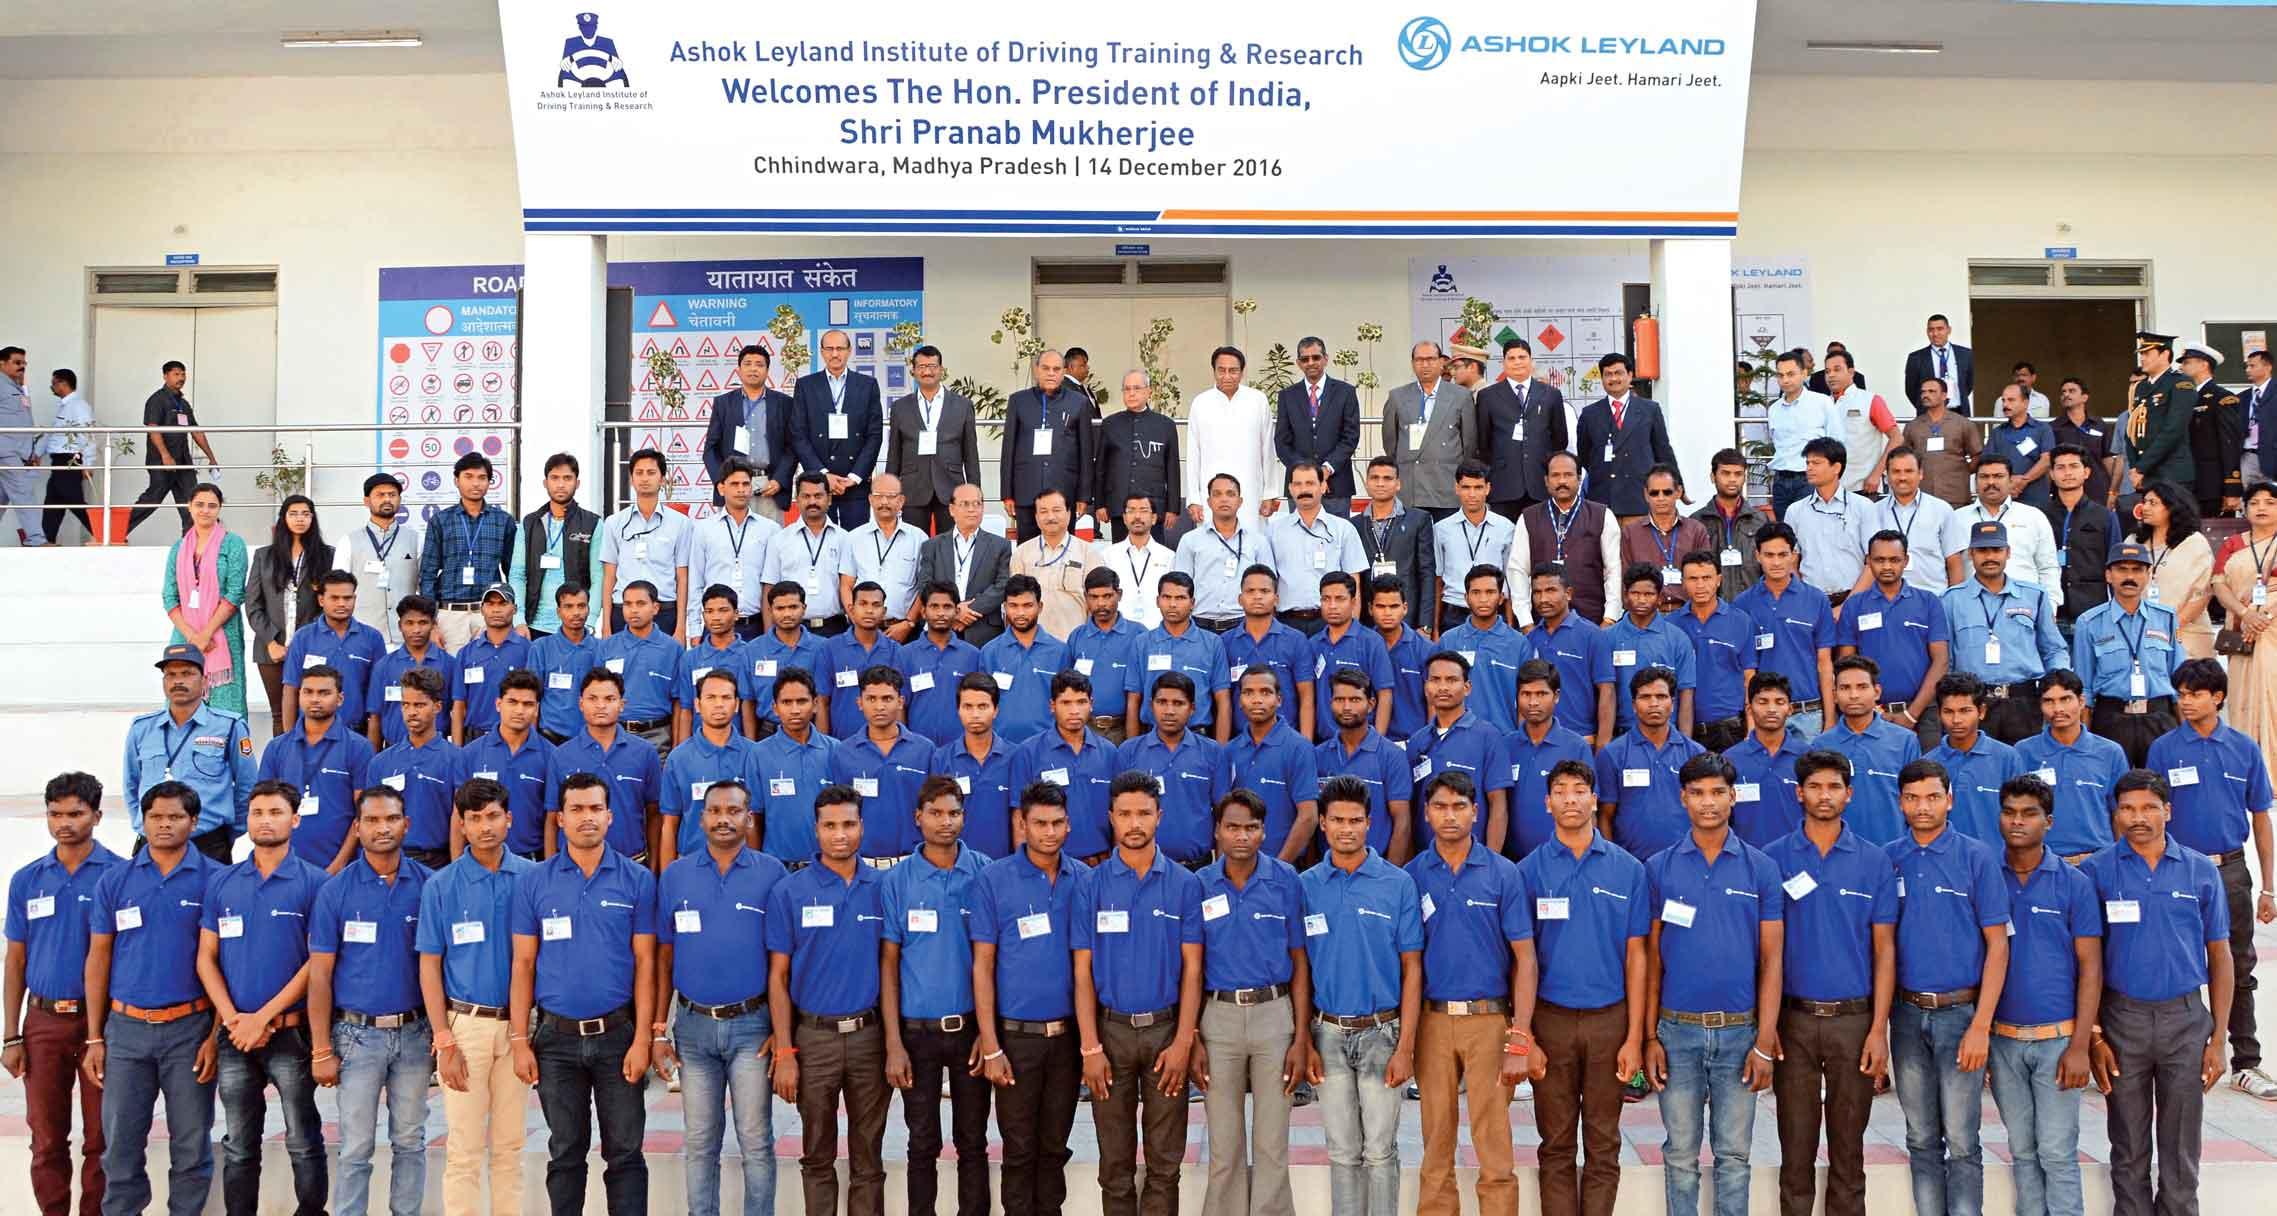 ashok leyland training Training and development in ashok leyland all over india dr v antony joe raja hod, department of management, sri muthukumaran institute of technology, near mangadu, kunrathur rd, chikkarayapuram, chennai, tamil nadu, 600 069 r anbu ranjith kumar research scholar.